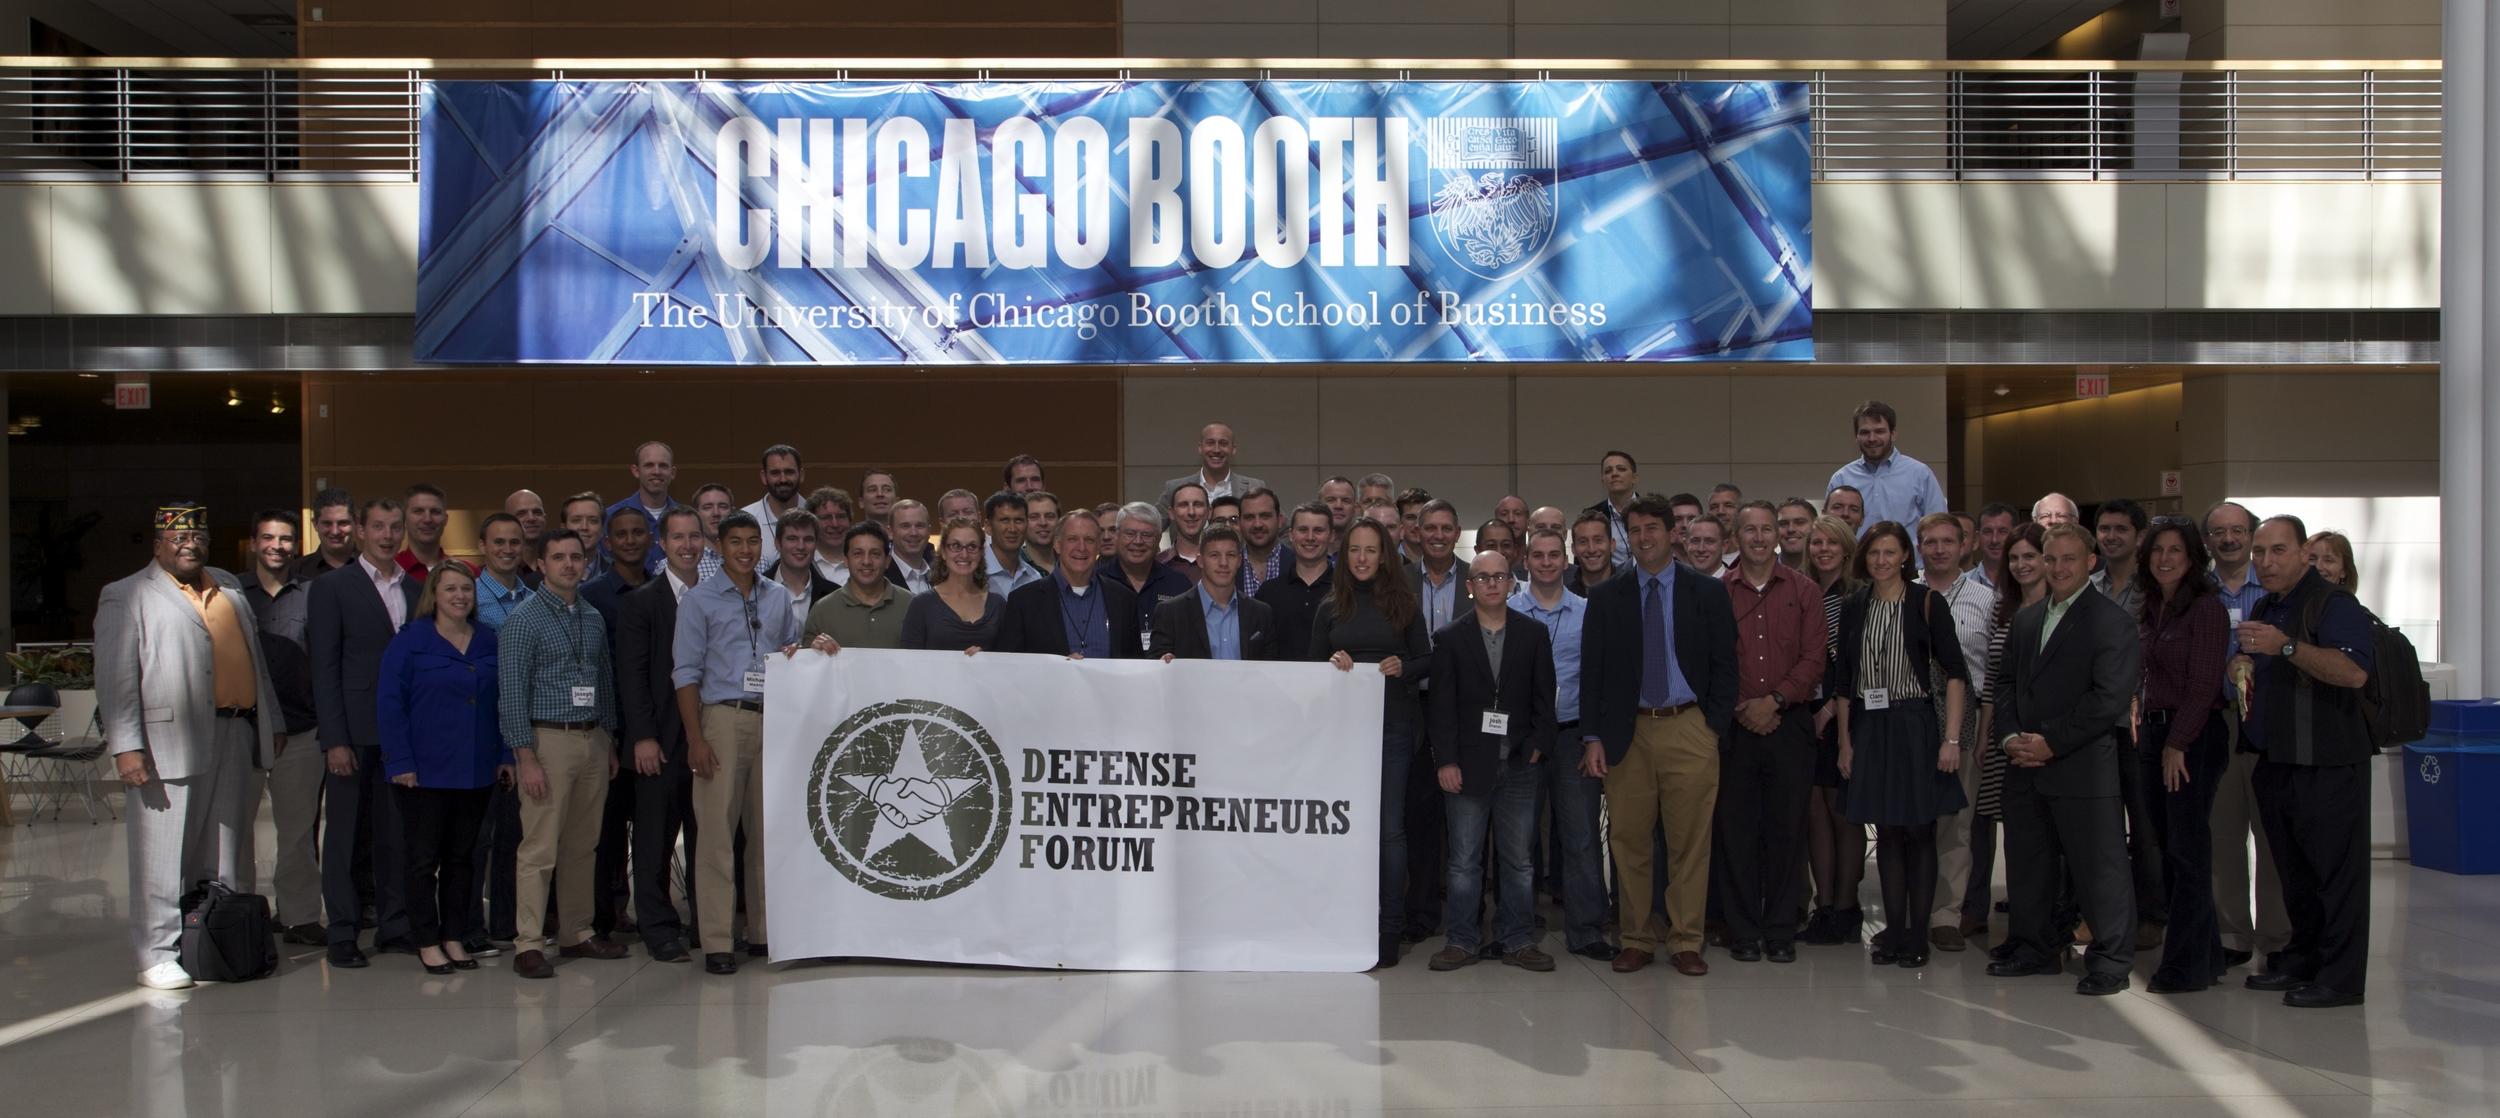 Defense Entrepreneurs Forum 2013